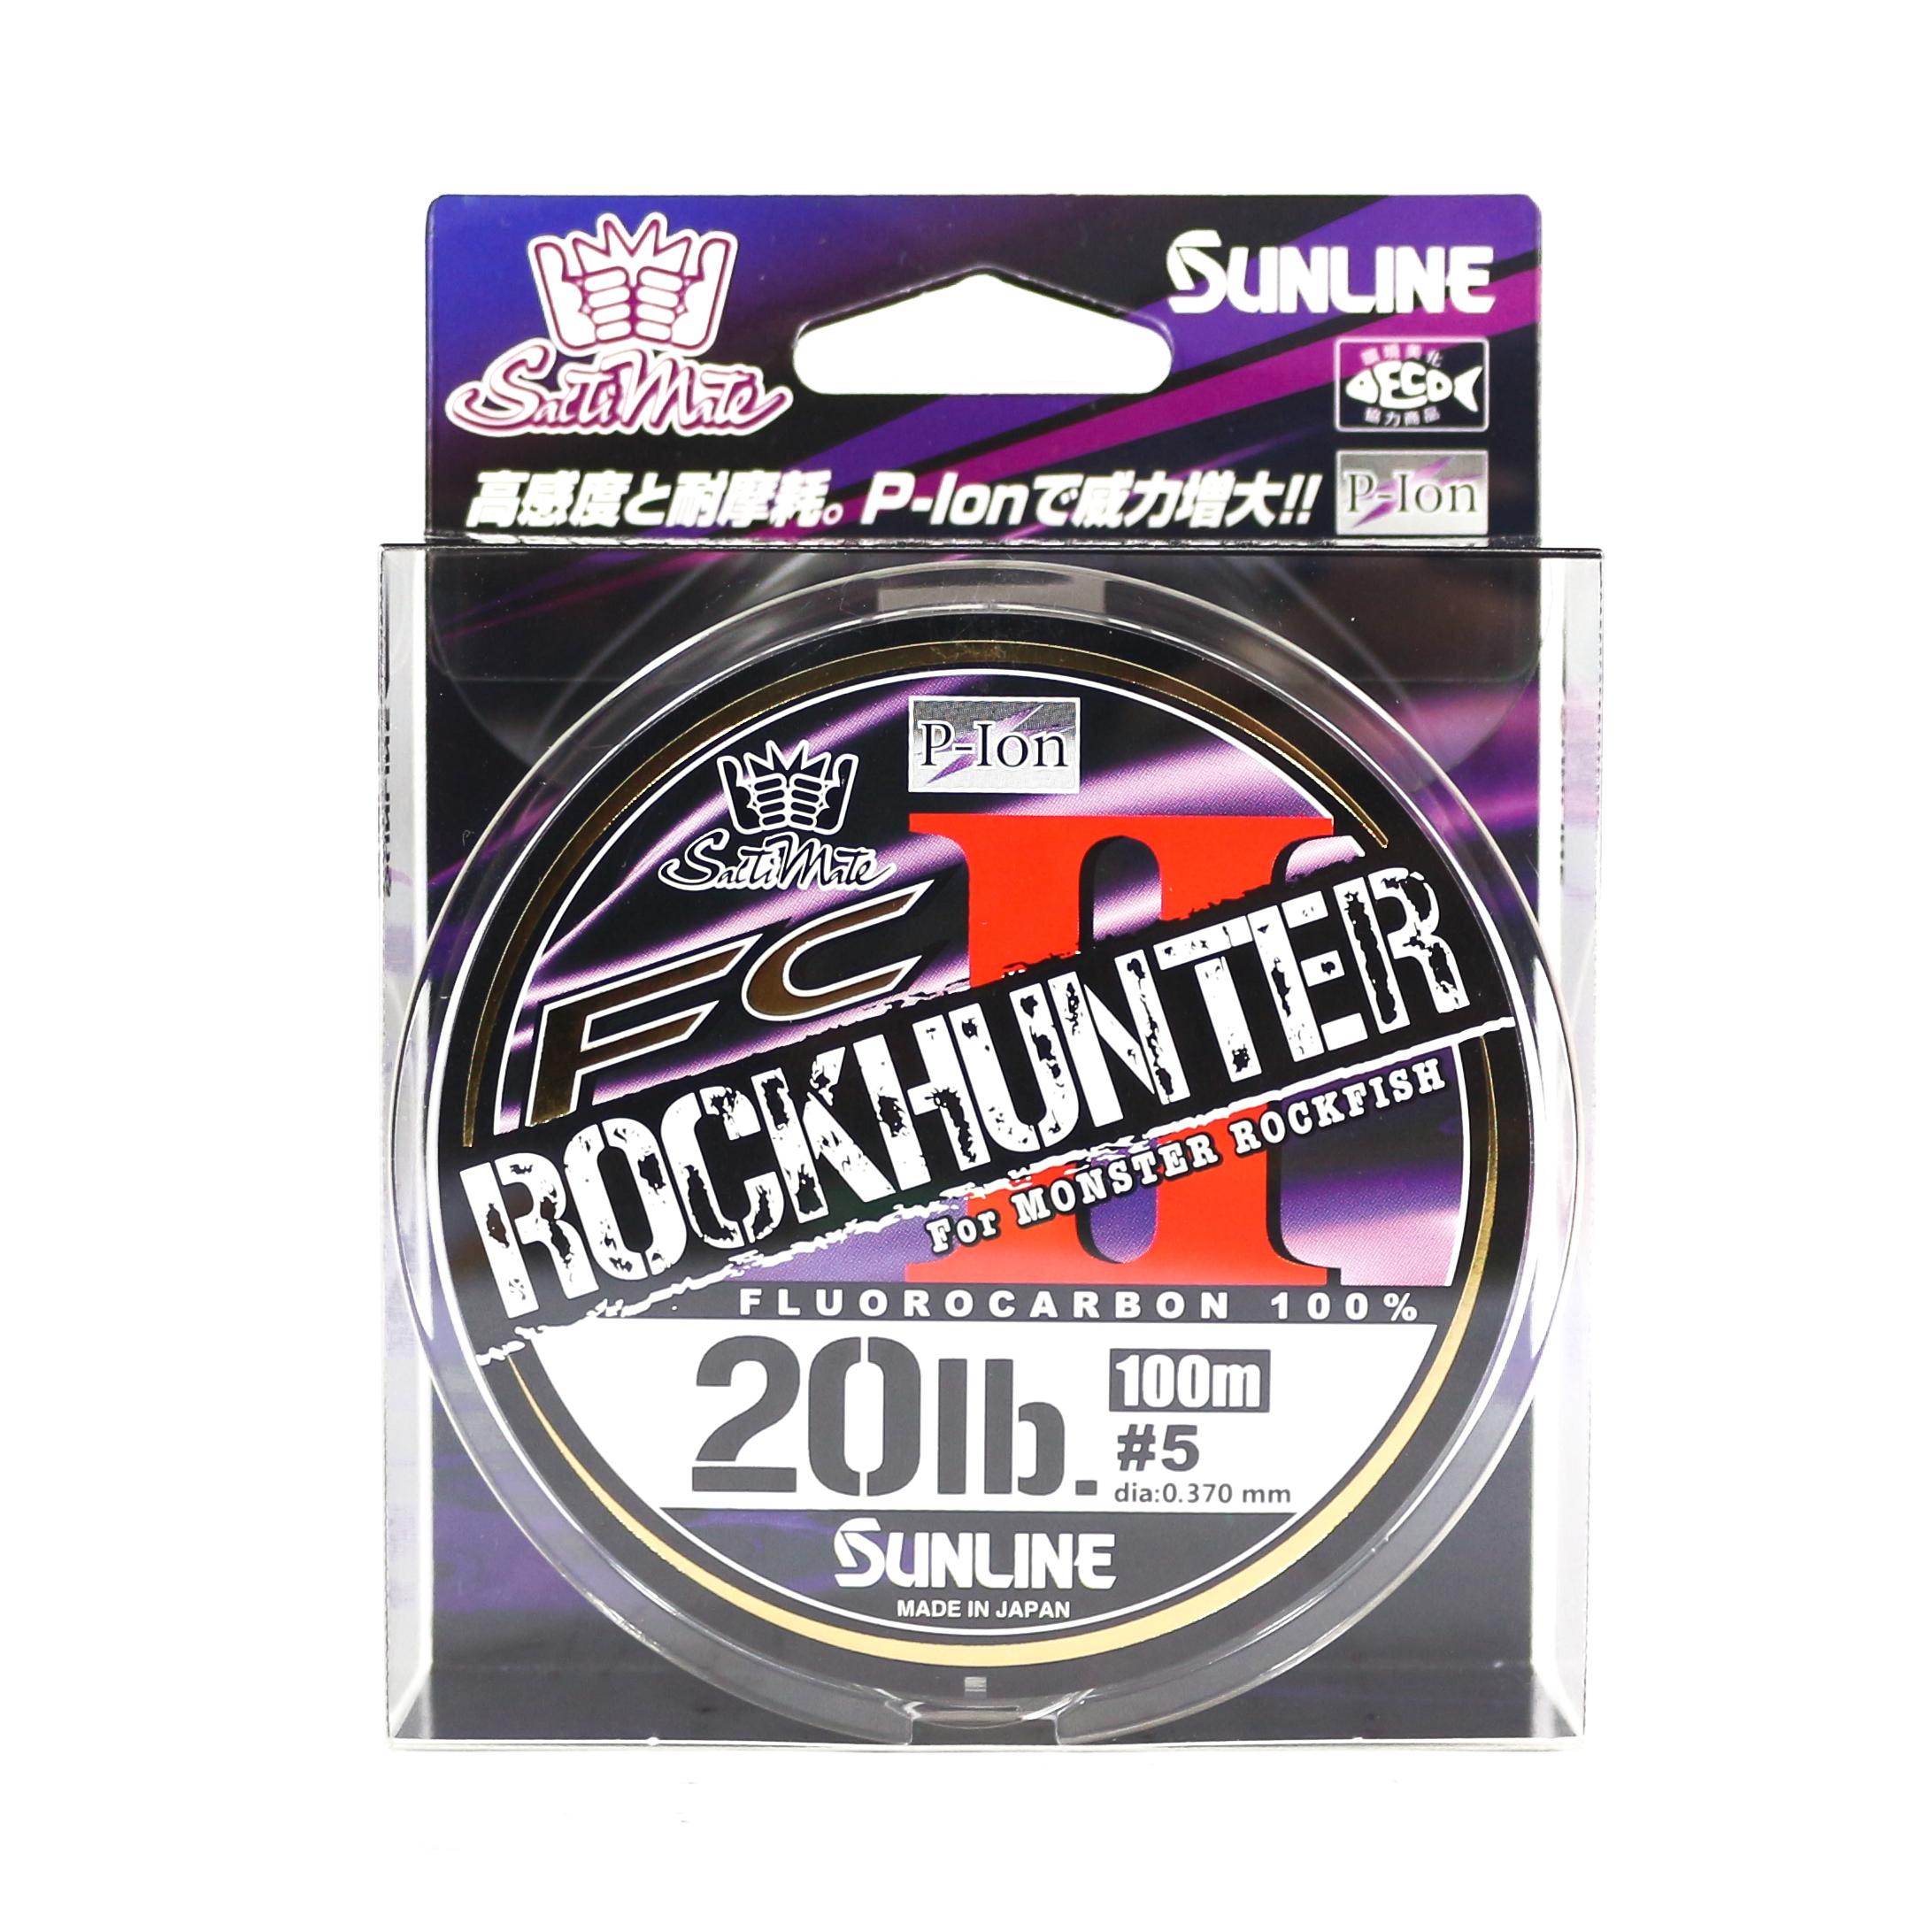 Sunline Fluorocarbon Line Rock Hunter II 100m 20lb , 0.37mm (9130)